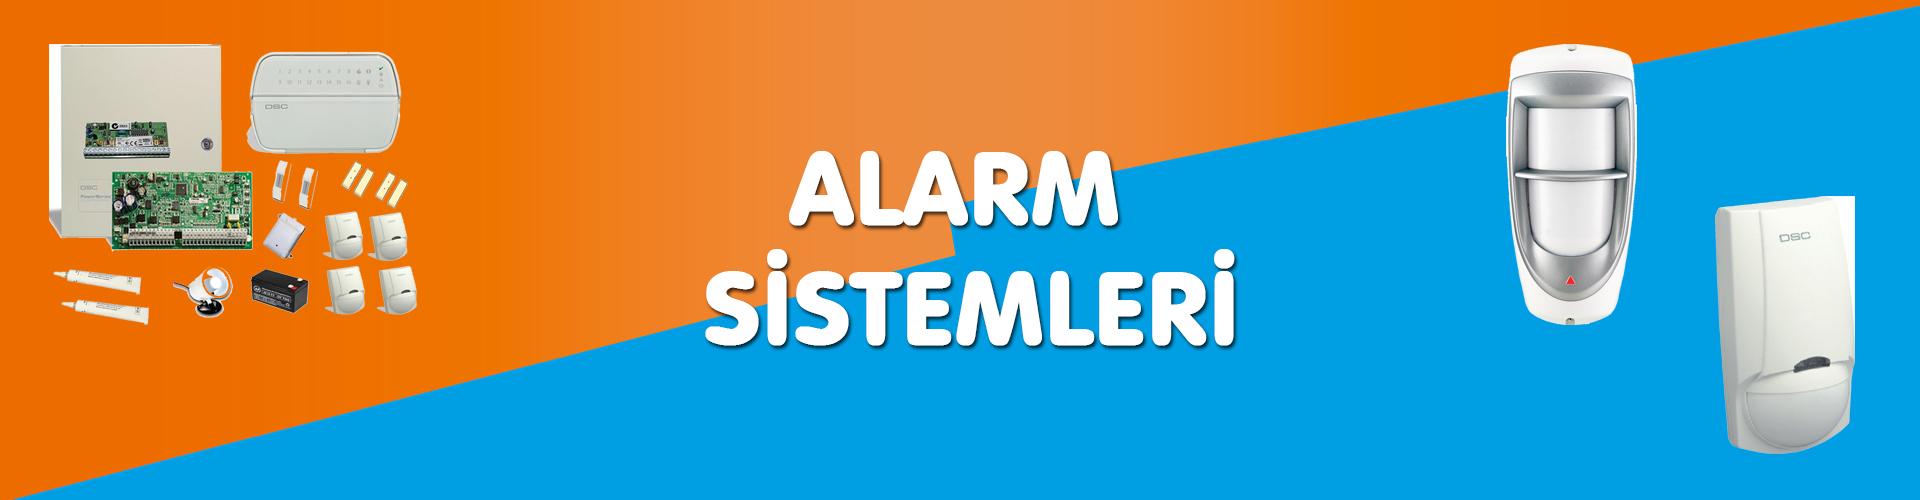 ALARM alarm sistemi